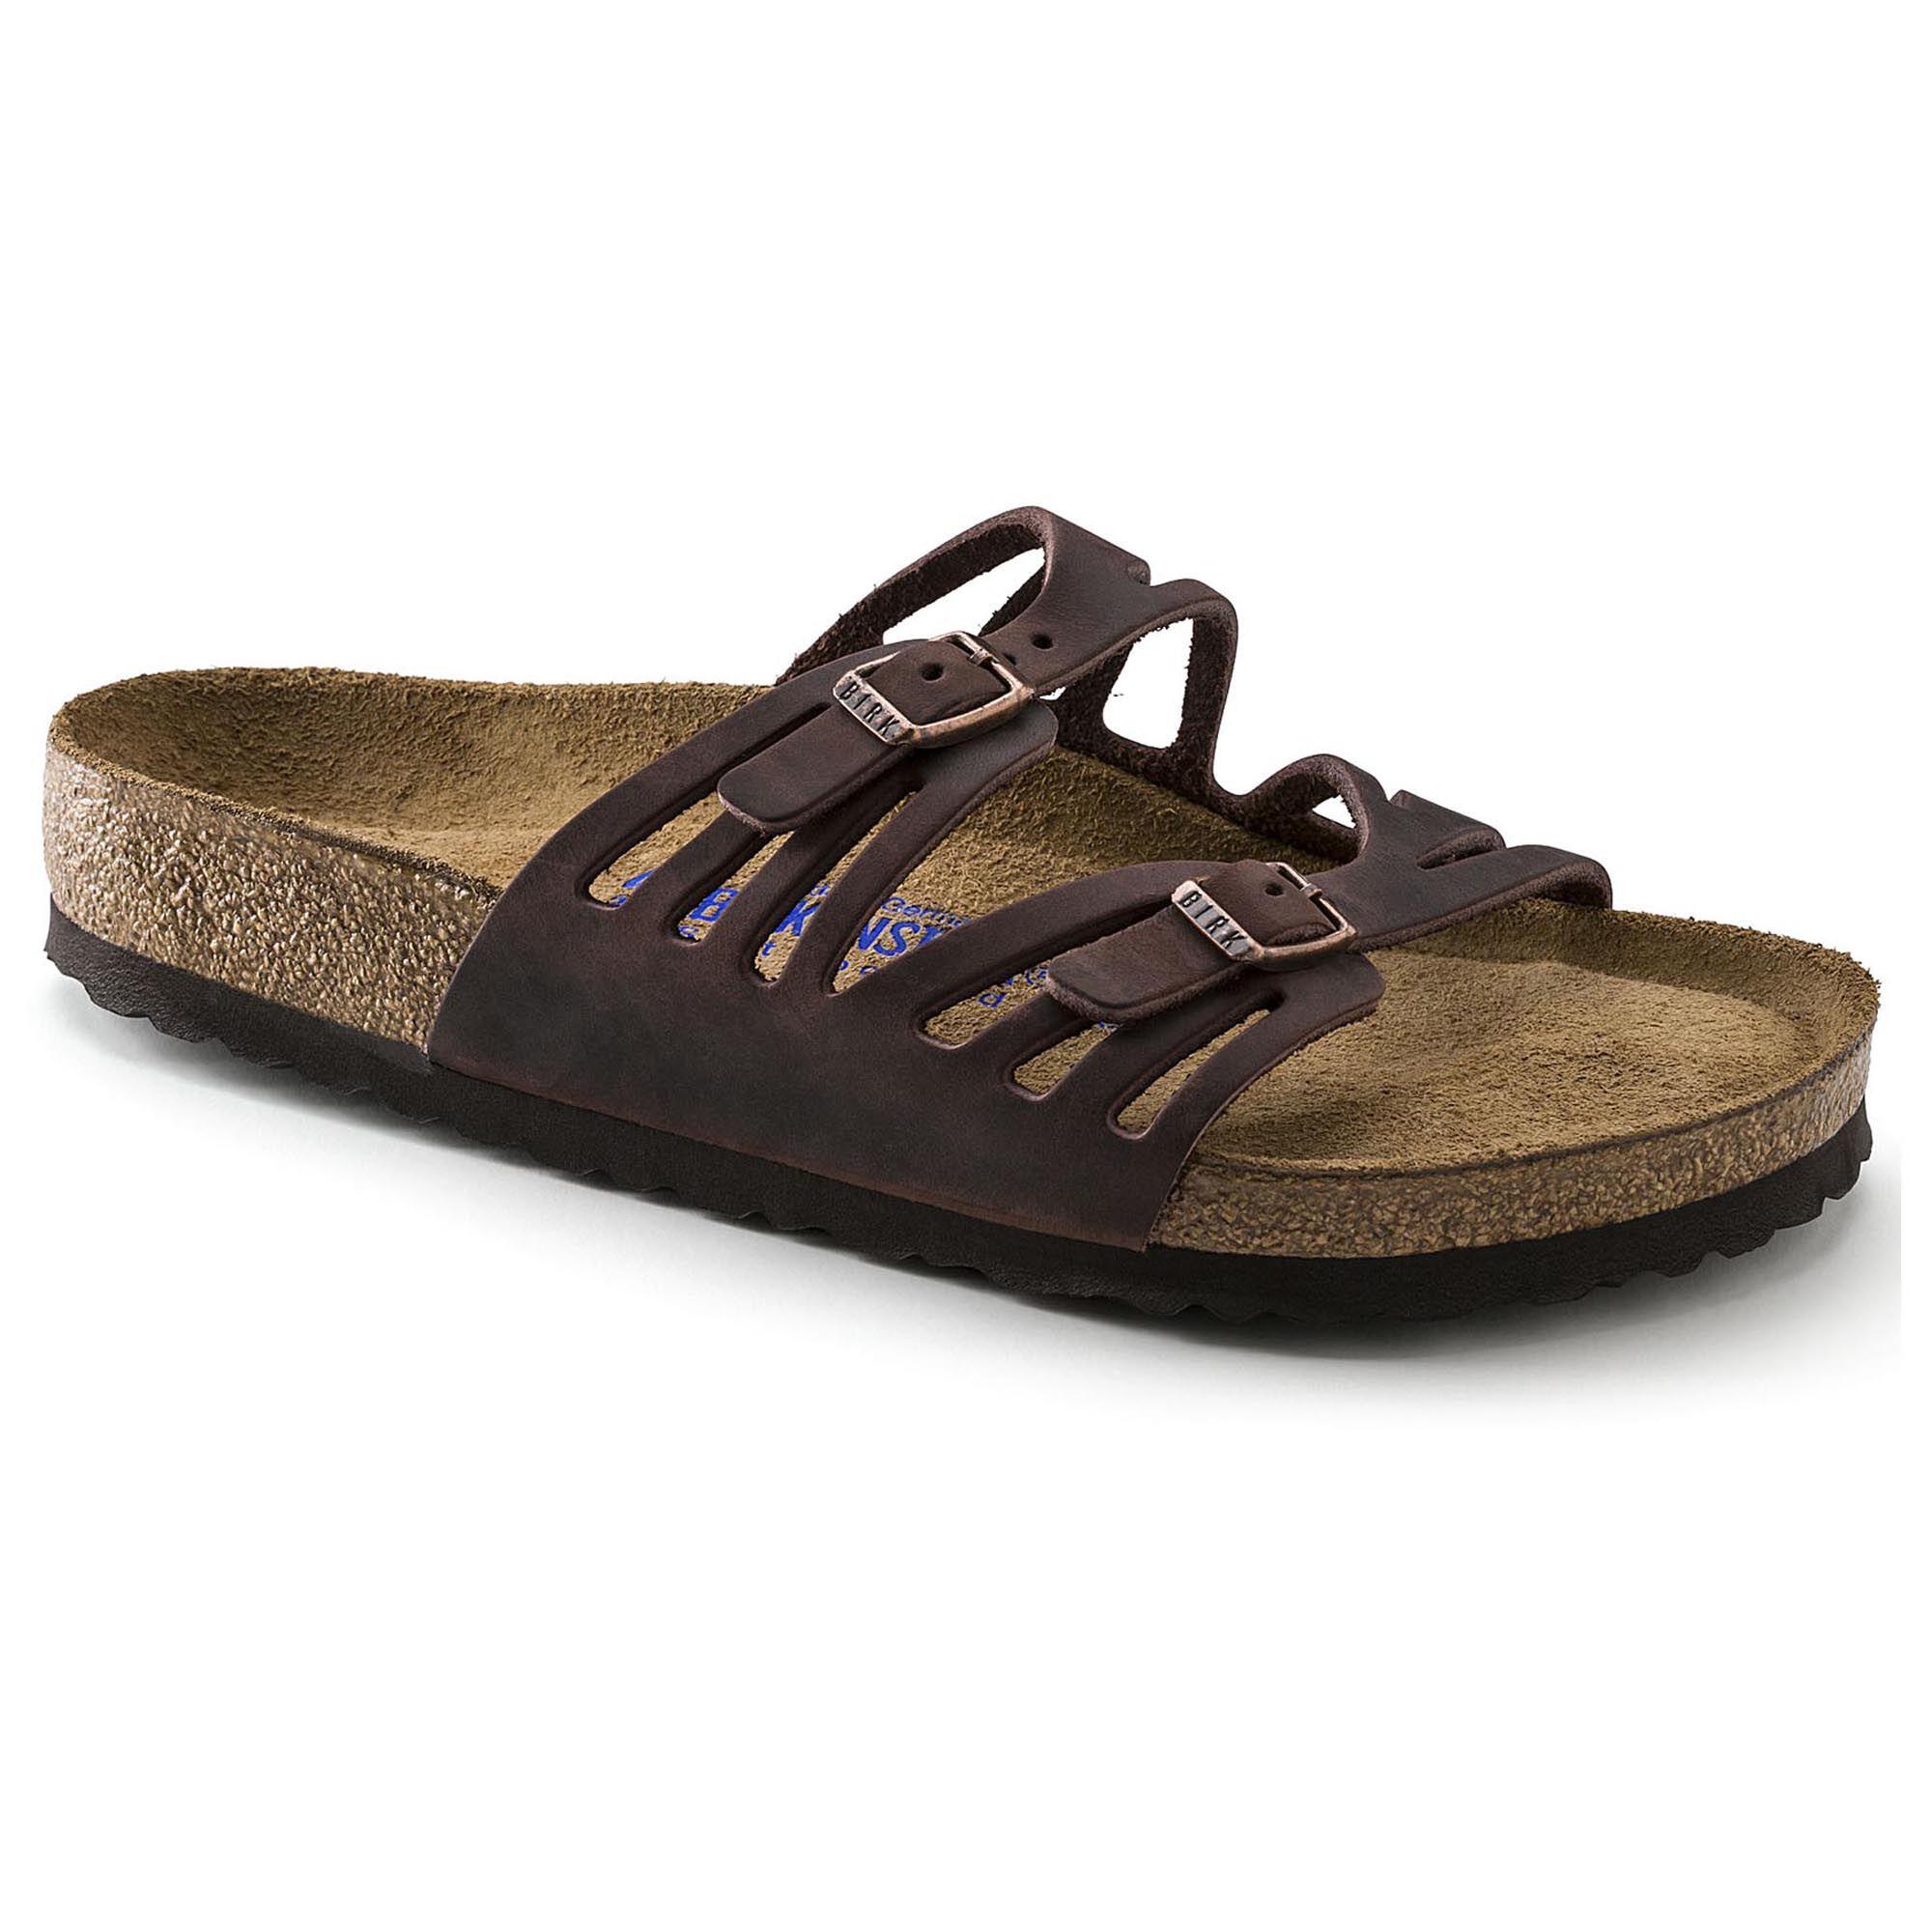 Granada Softbed Leather Sandals y77neN1